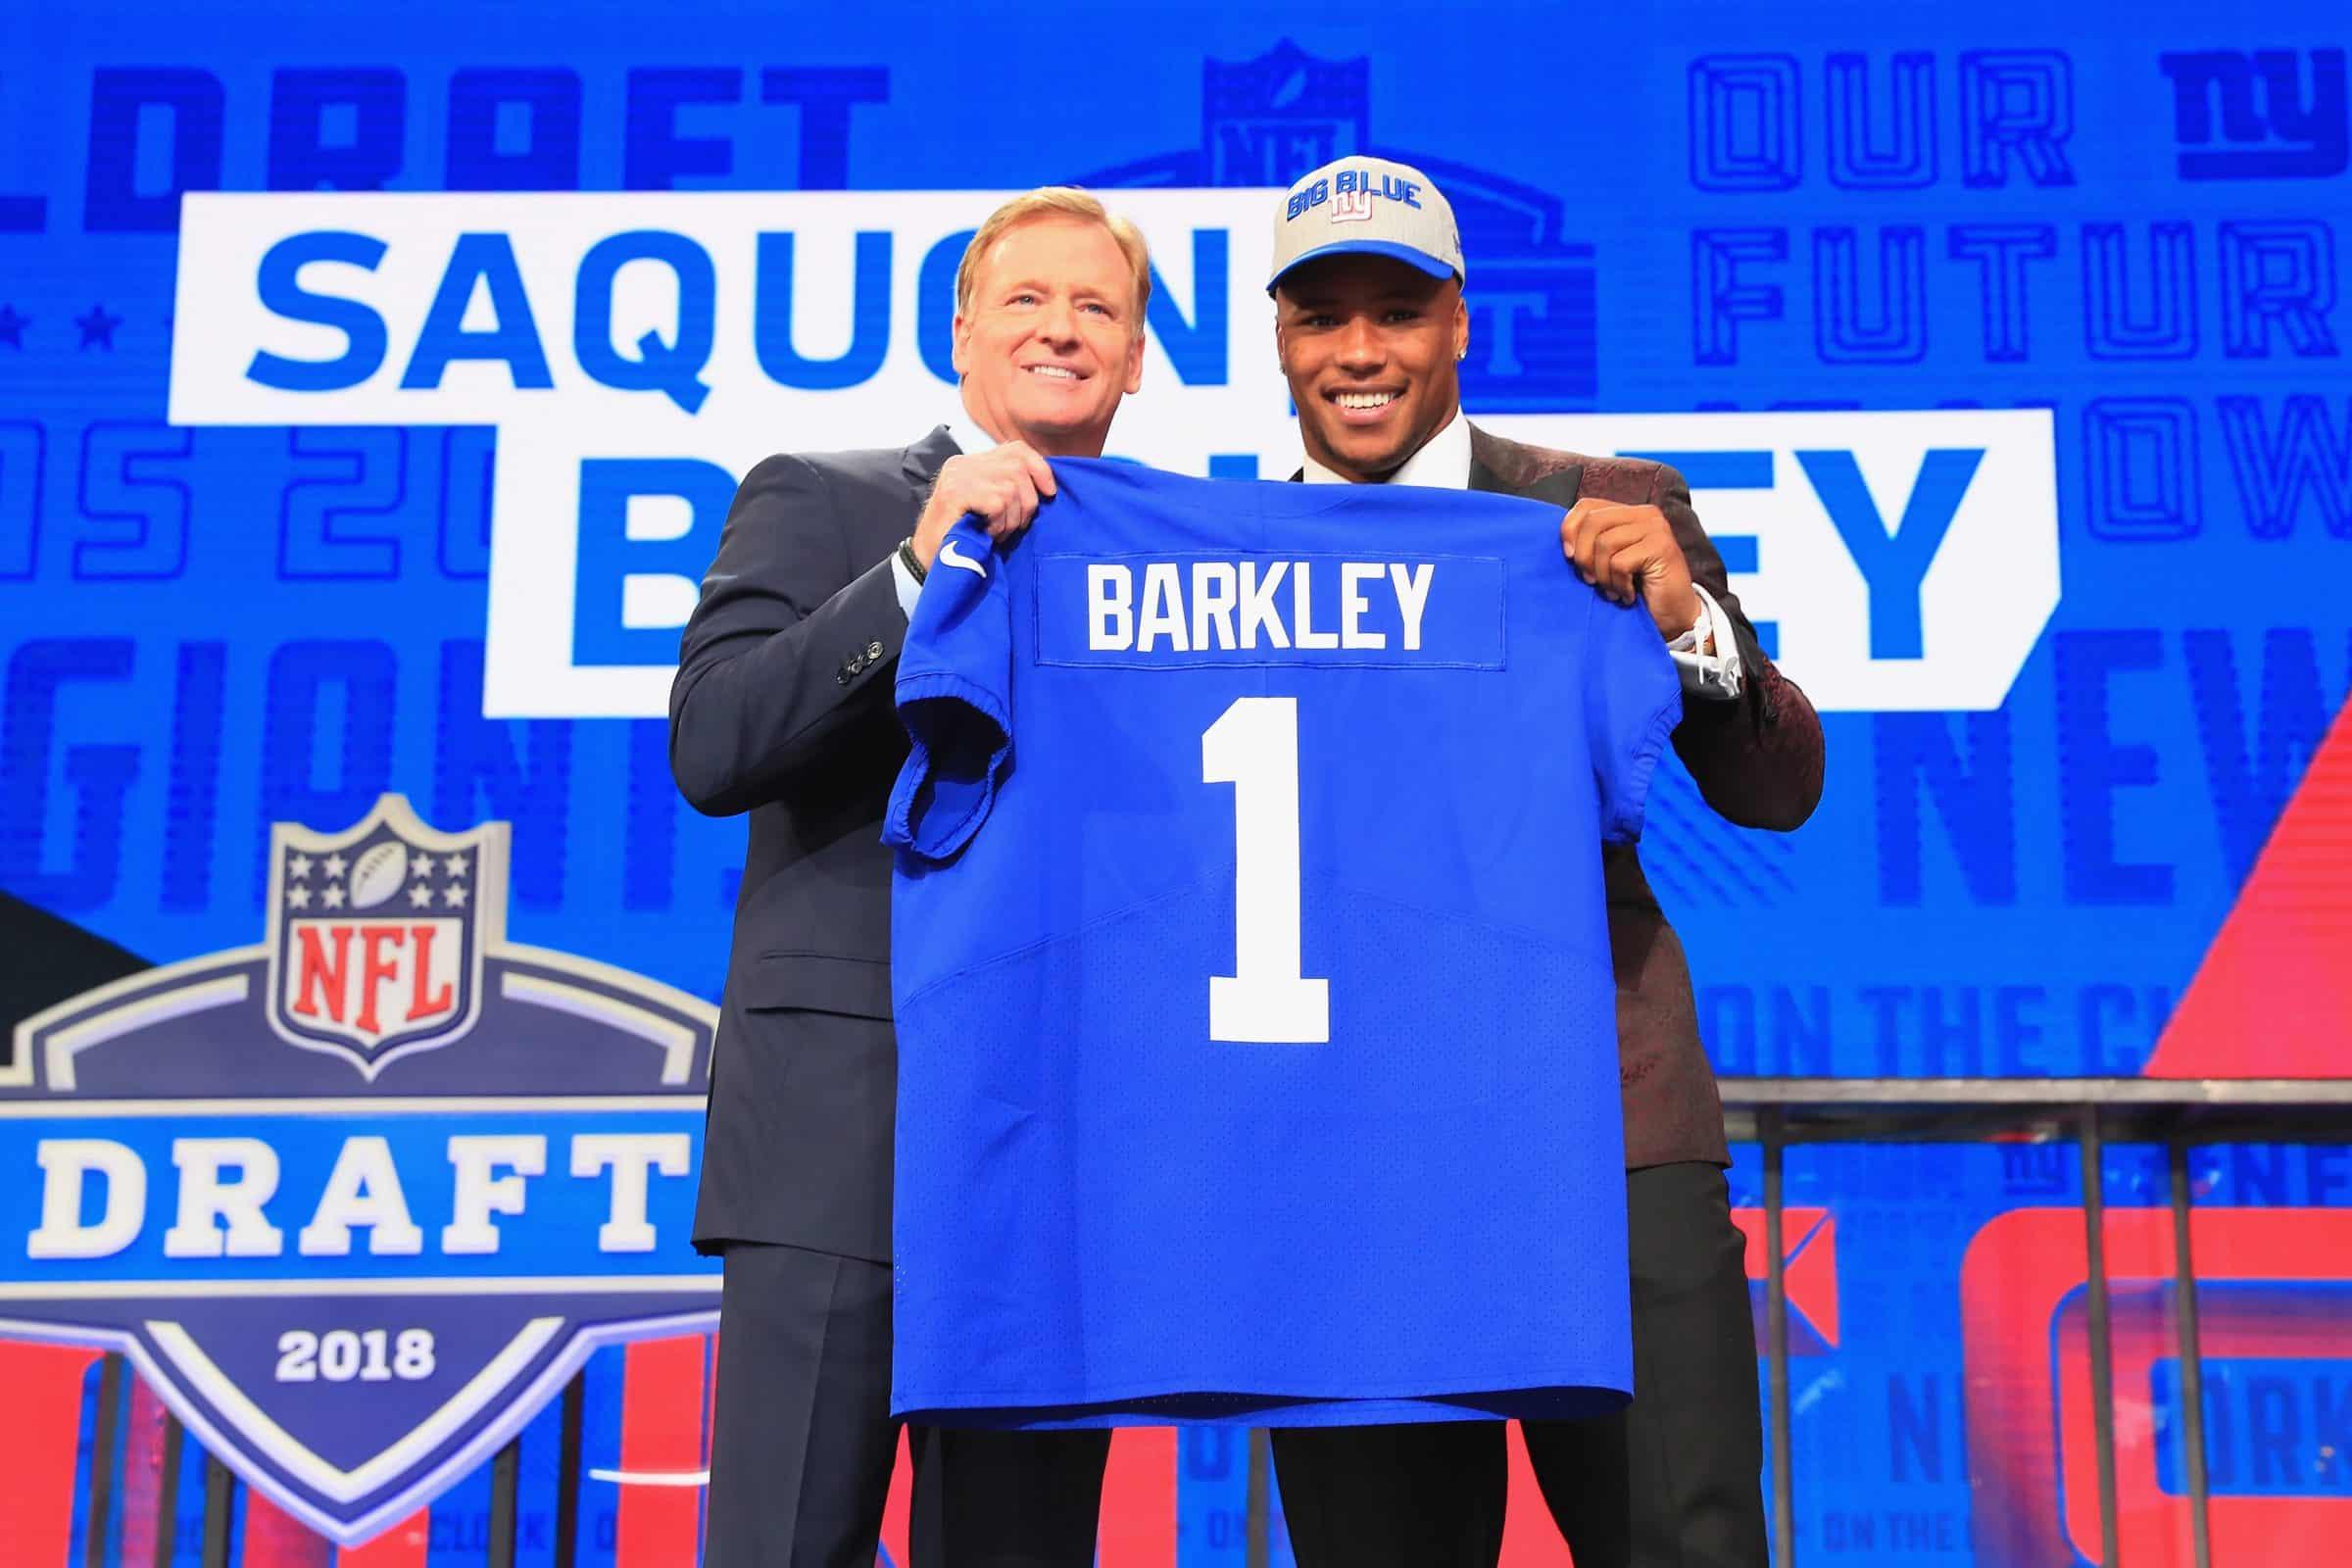 Saquon Barkley, New York Giants